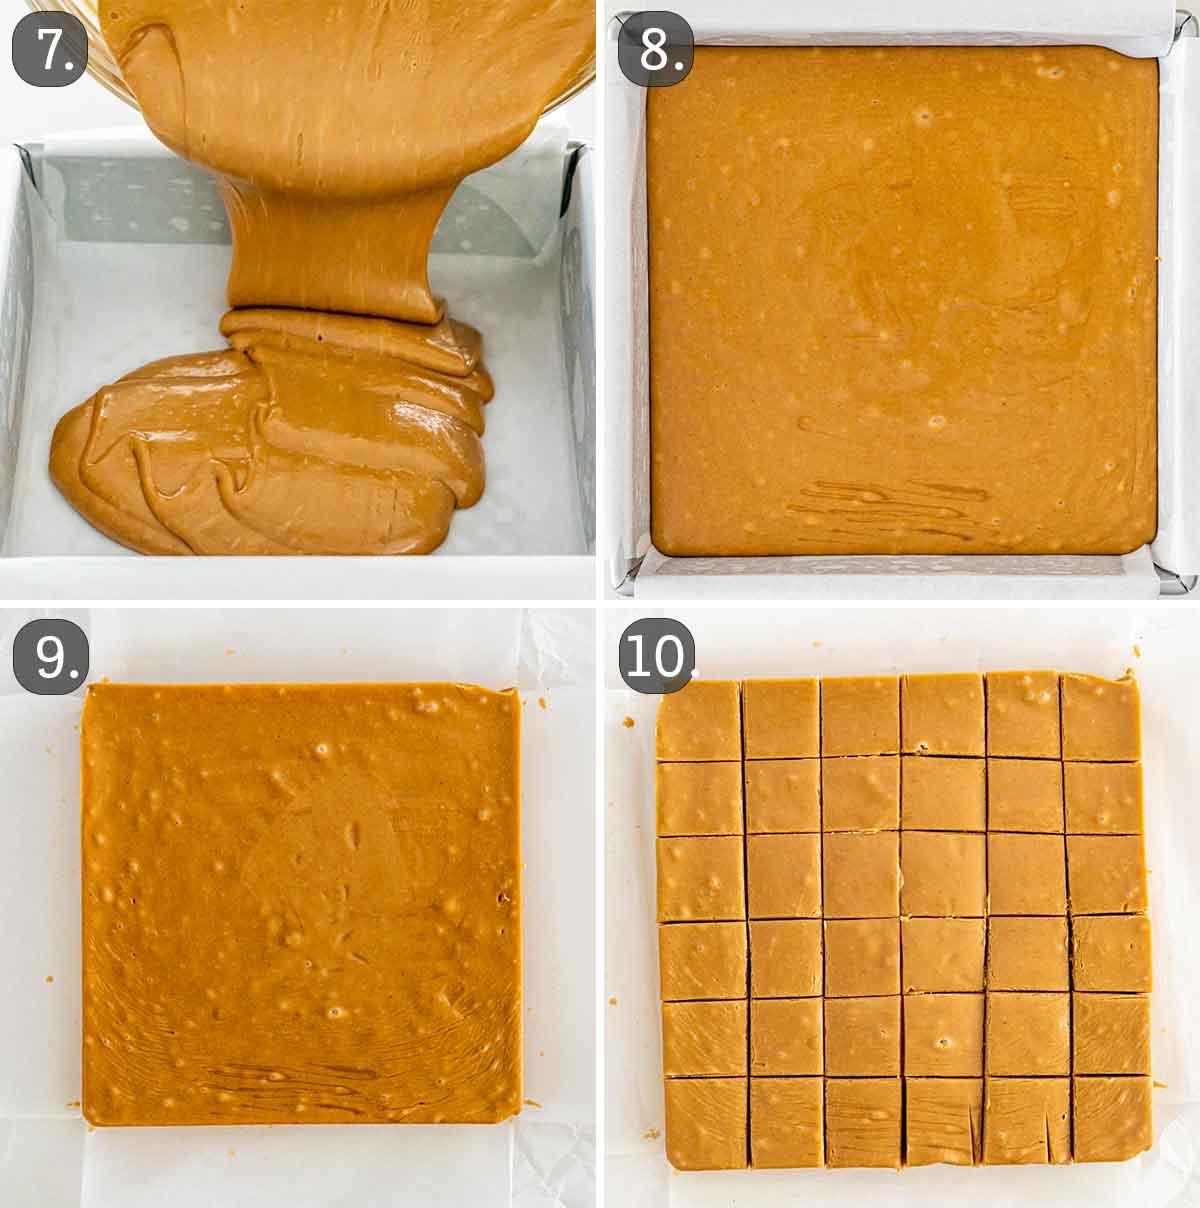 process shots showing how to pour fudge, set it and cut into pieces.